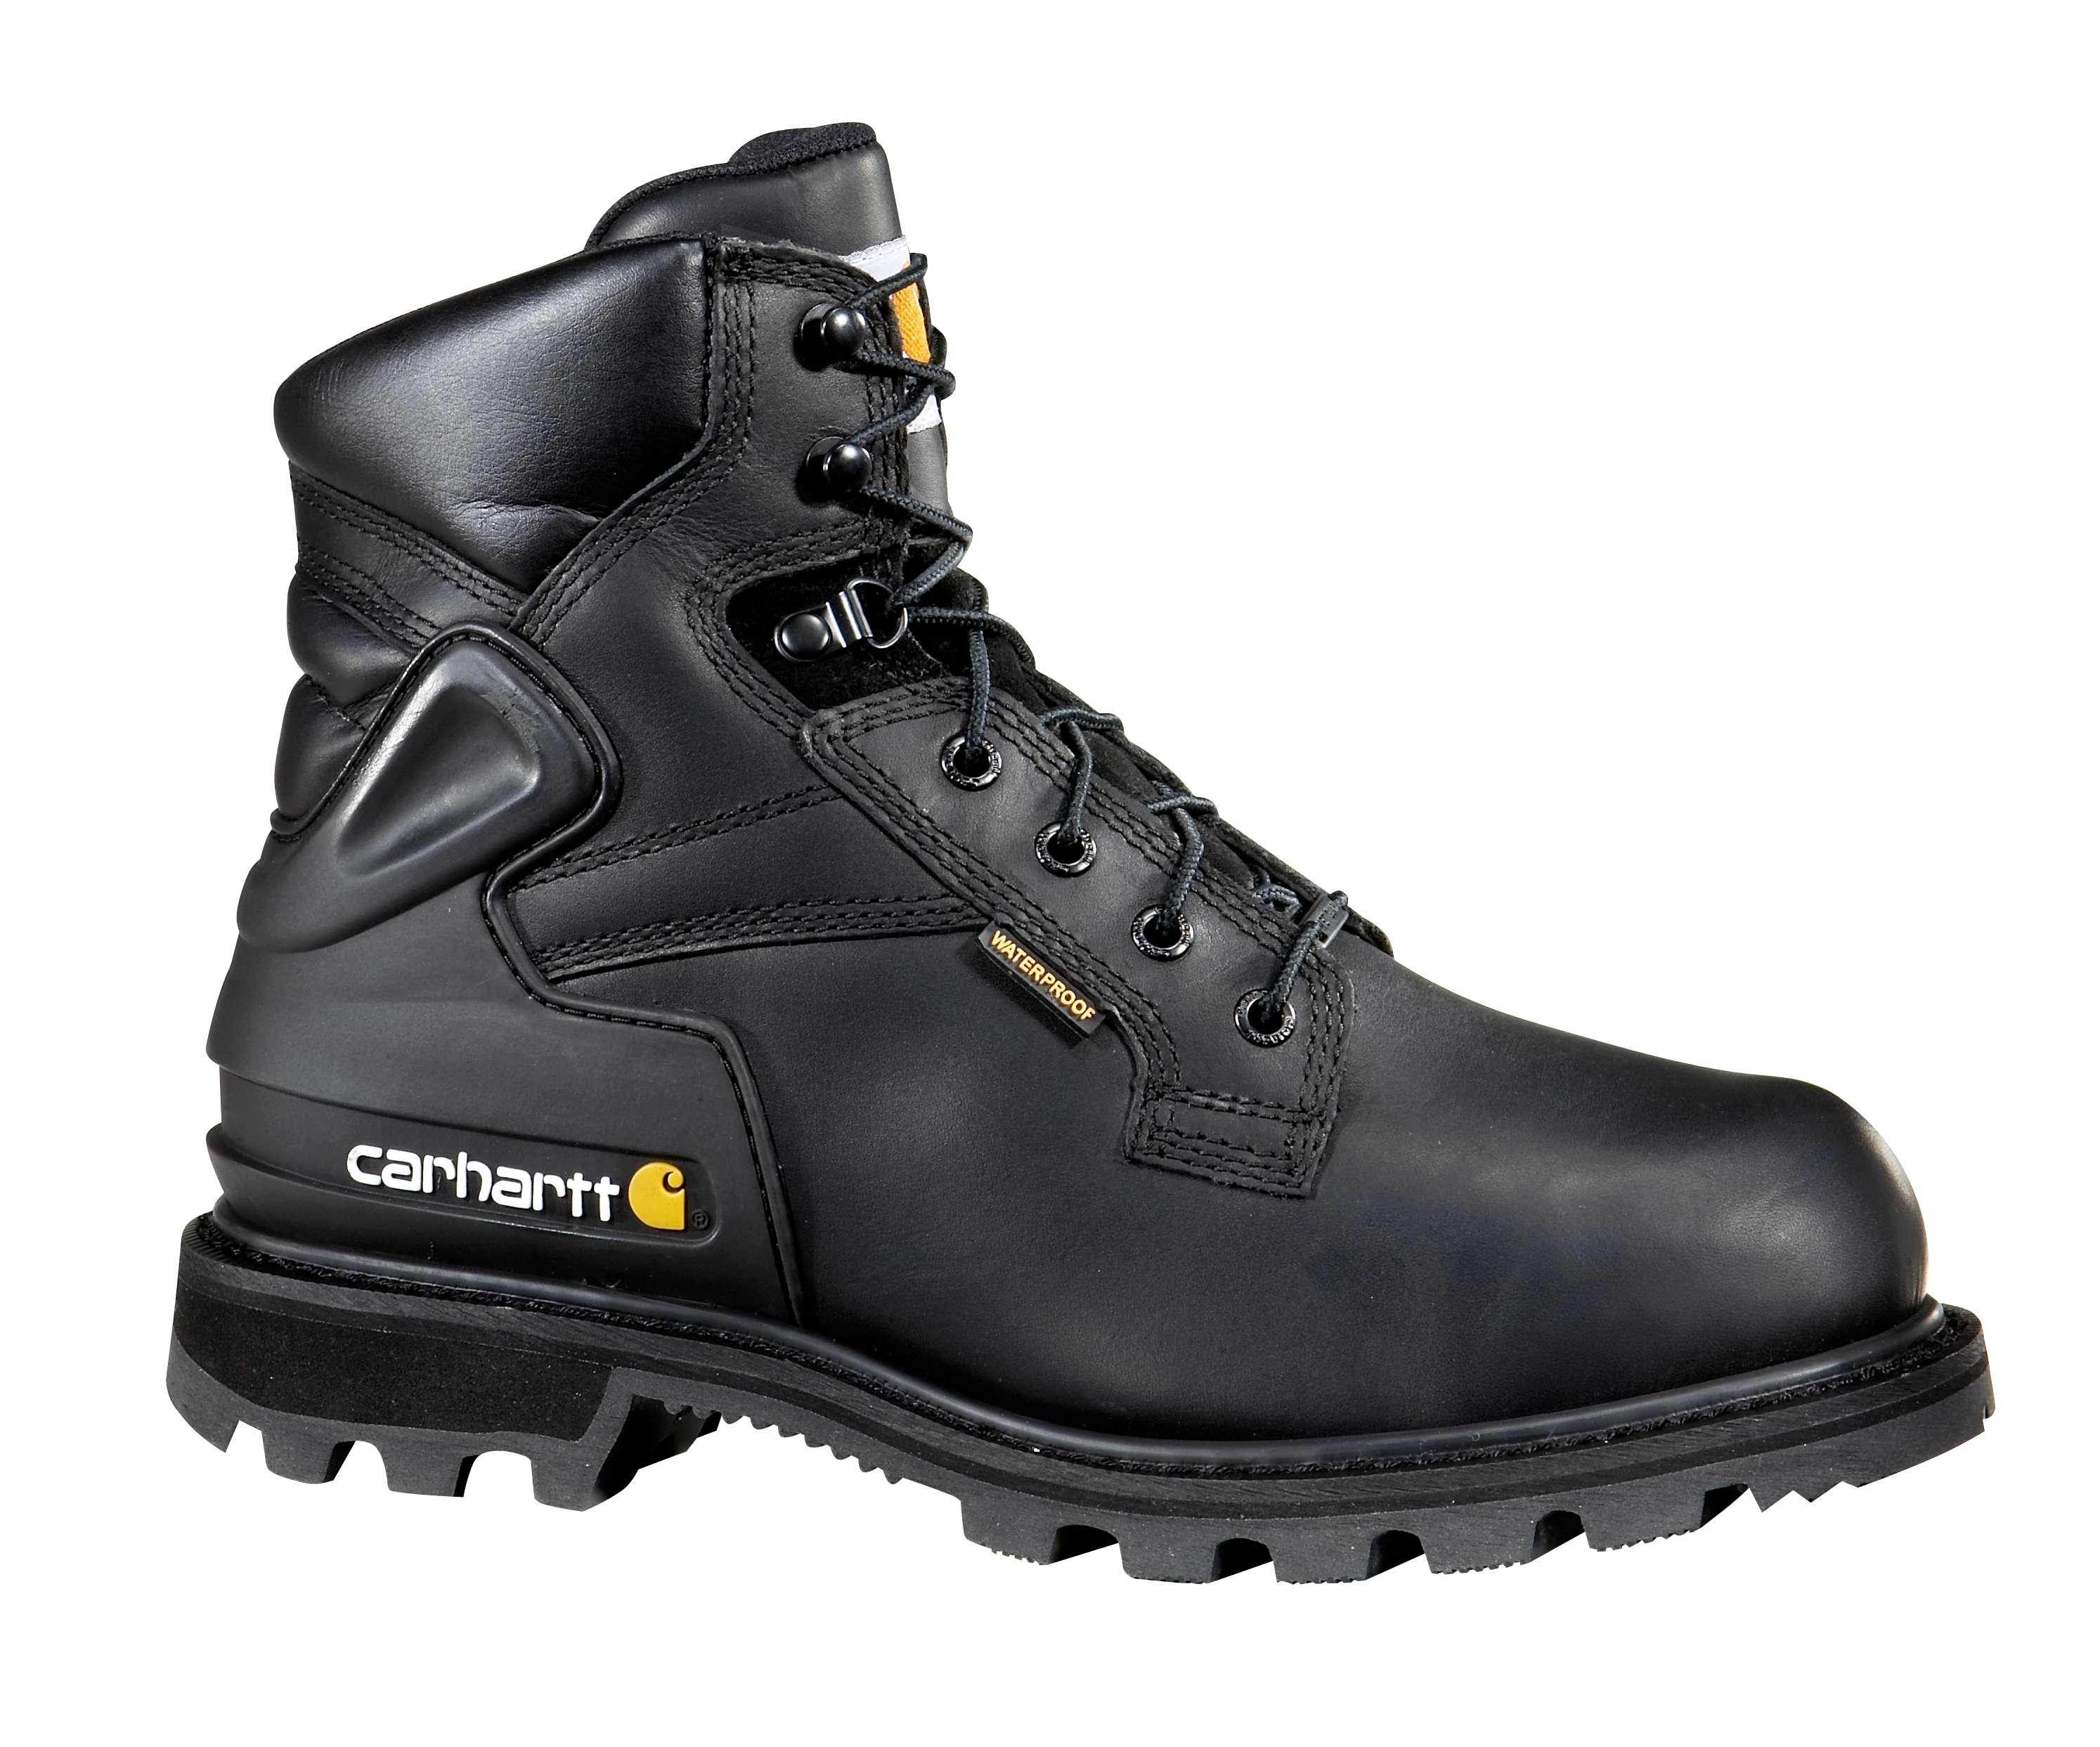 Carhartt 6 Inch Internal Met Guard Steel Toe Work Boot